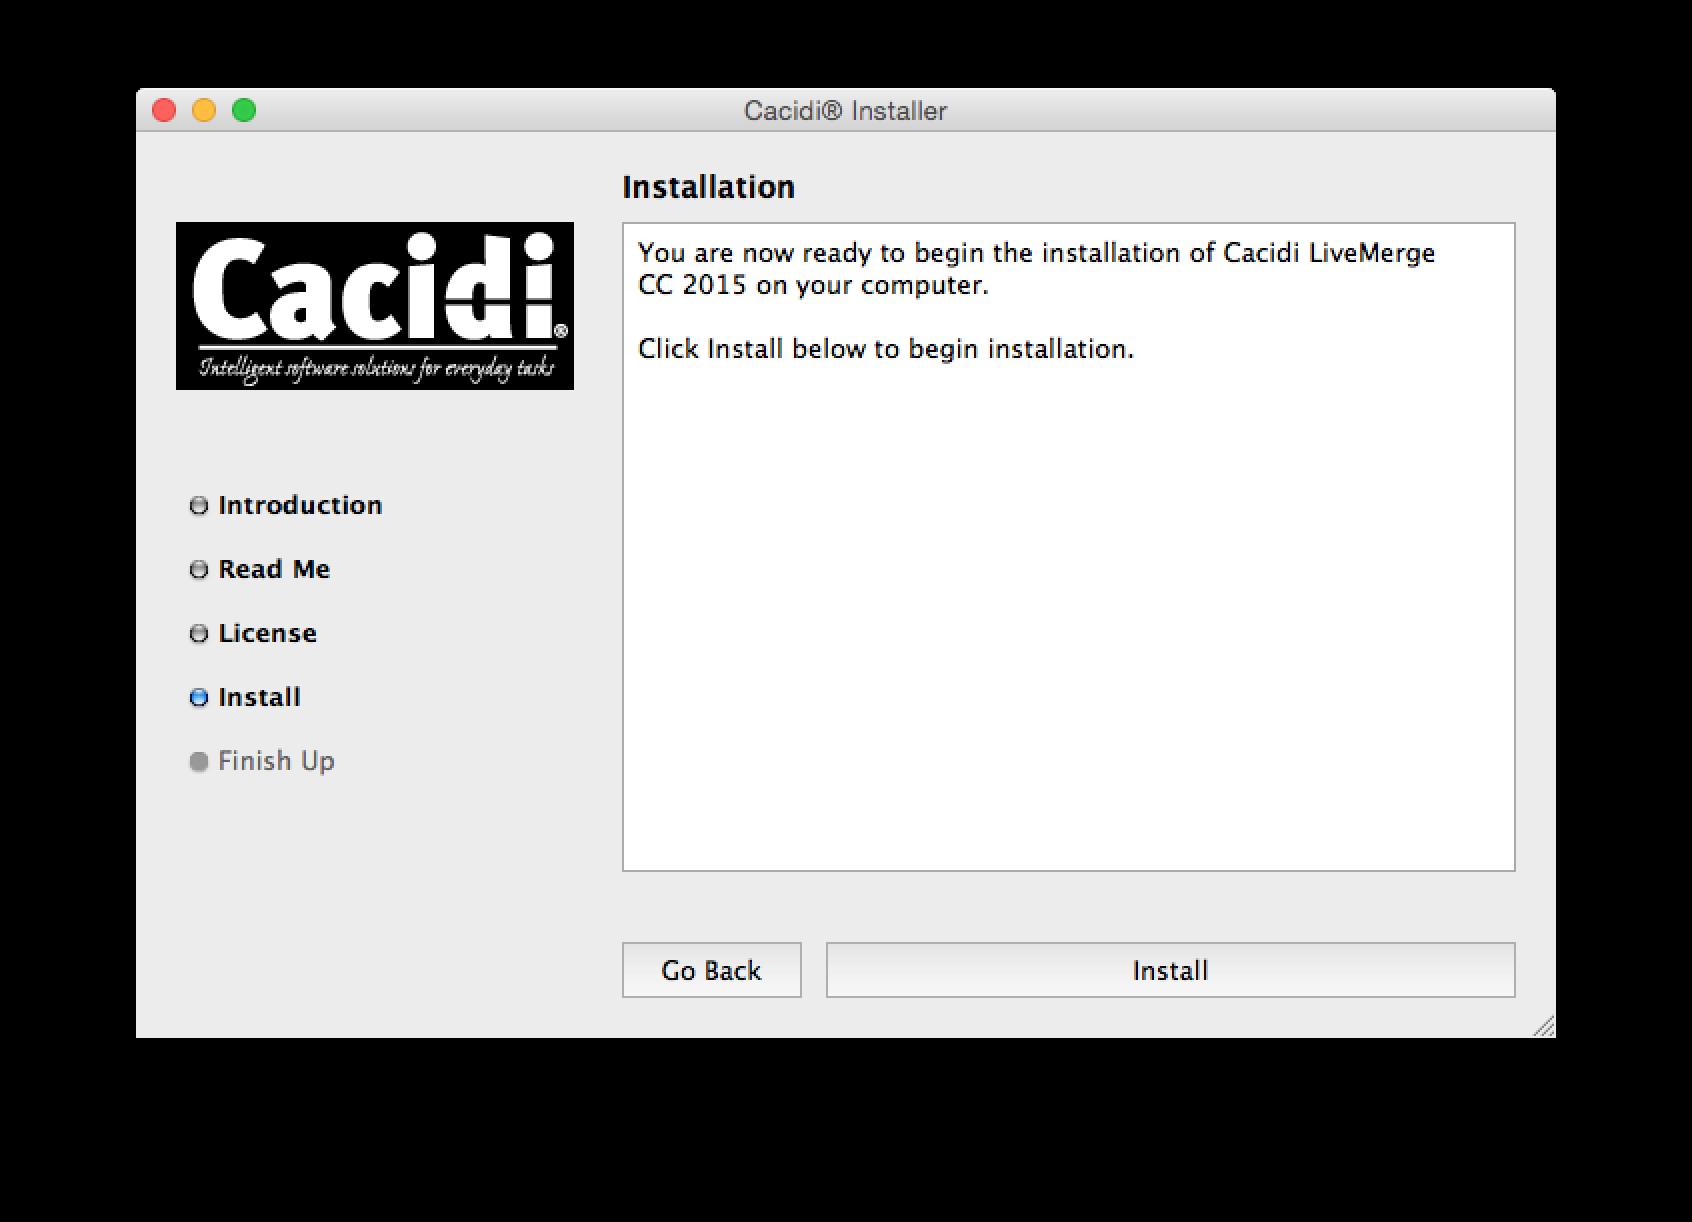 CacidiInst_D